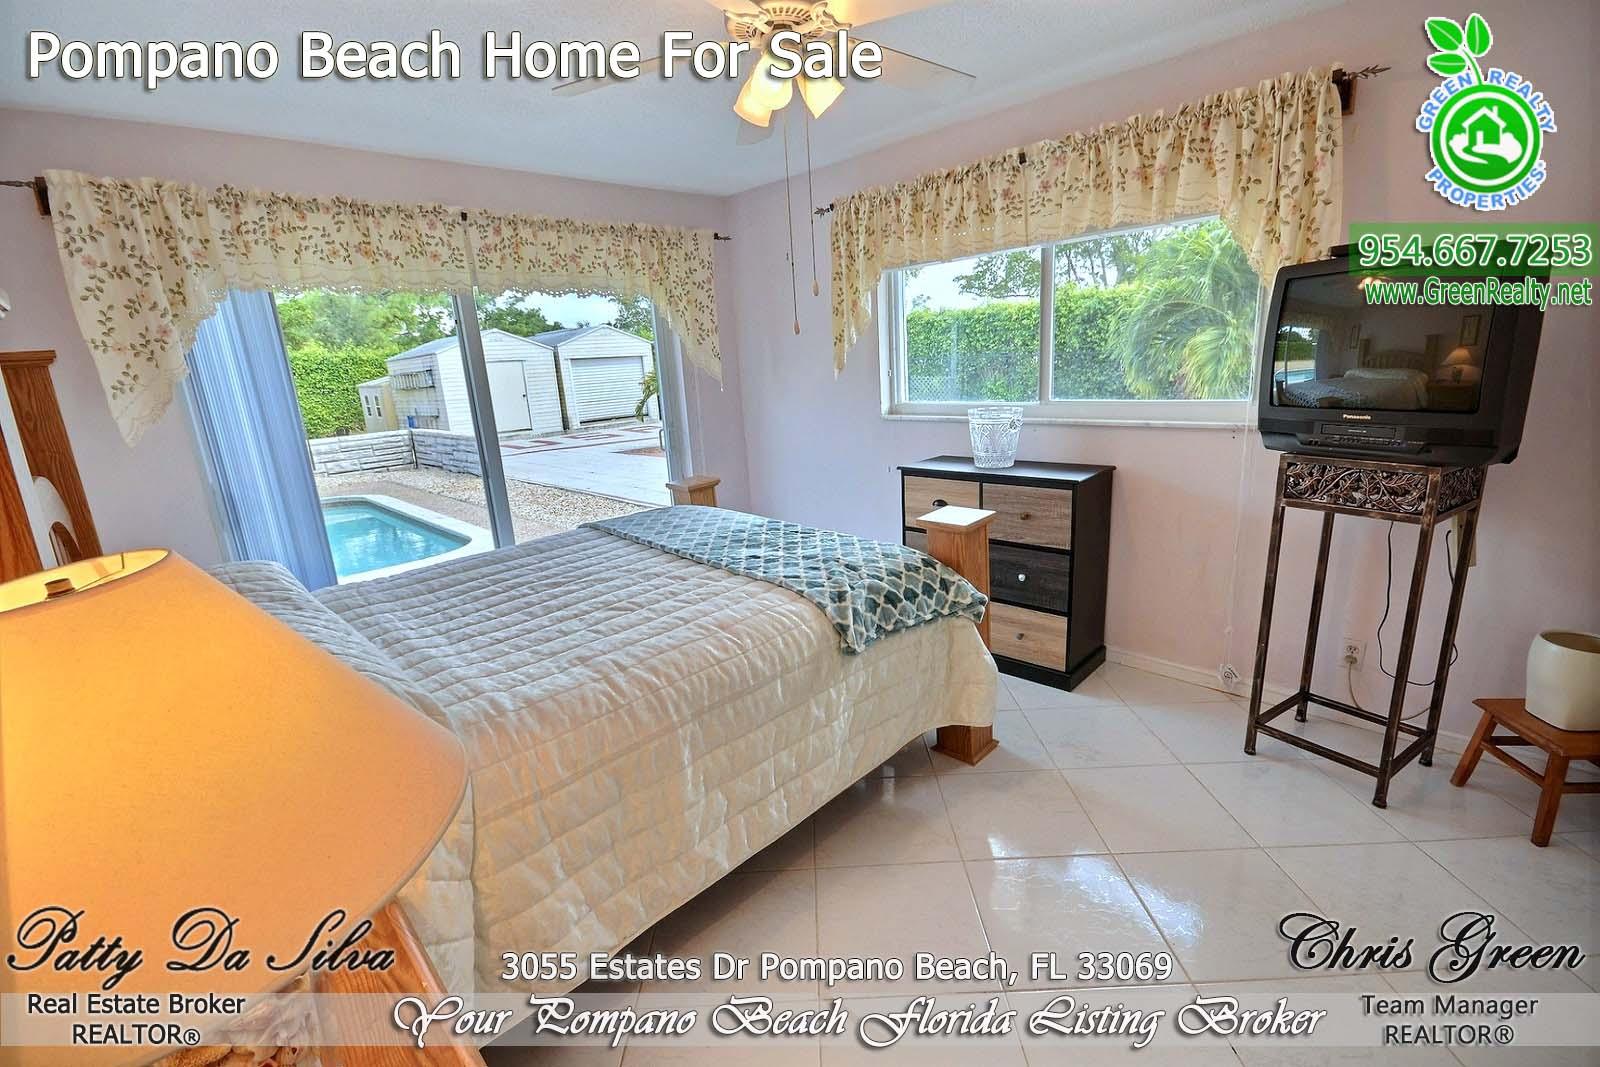 25 Top Pompano Beach Realtors (1)